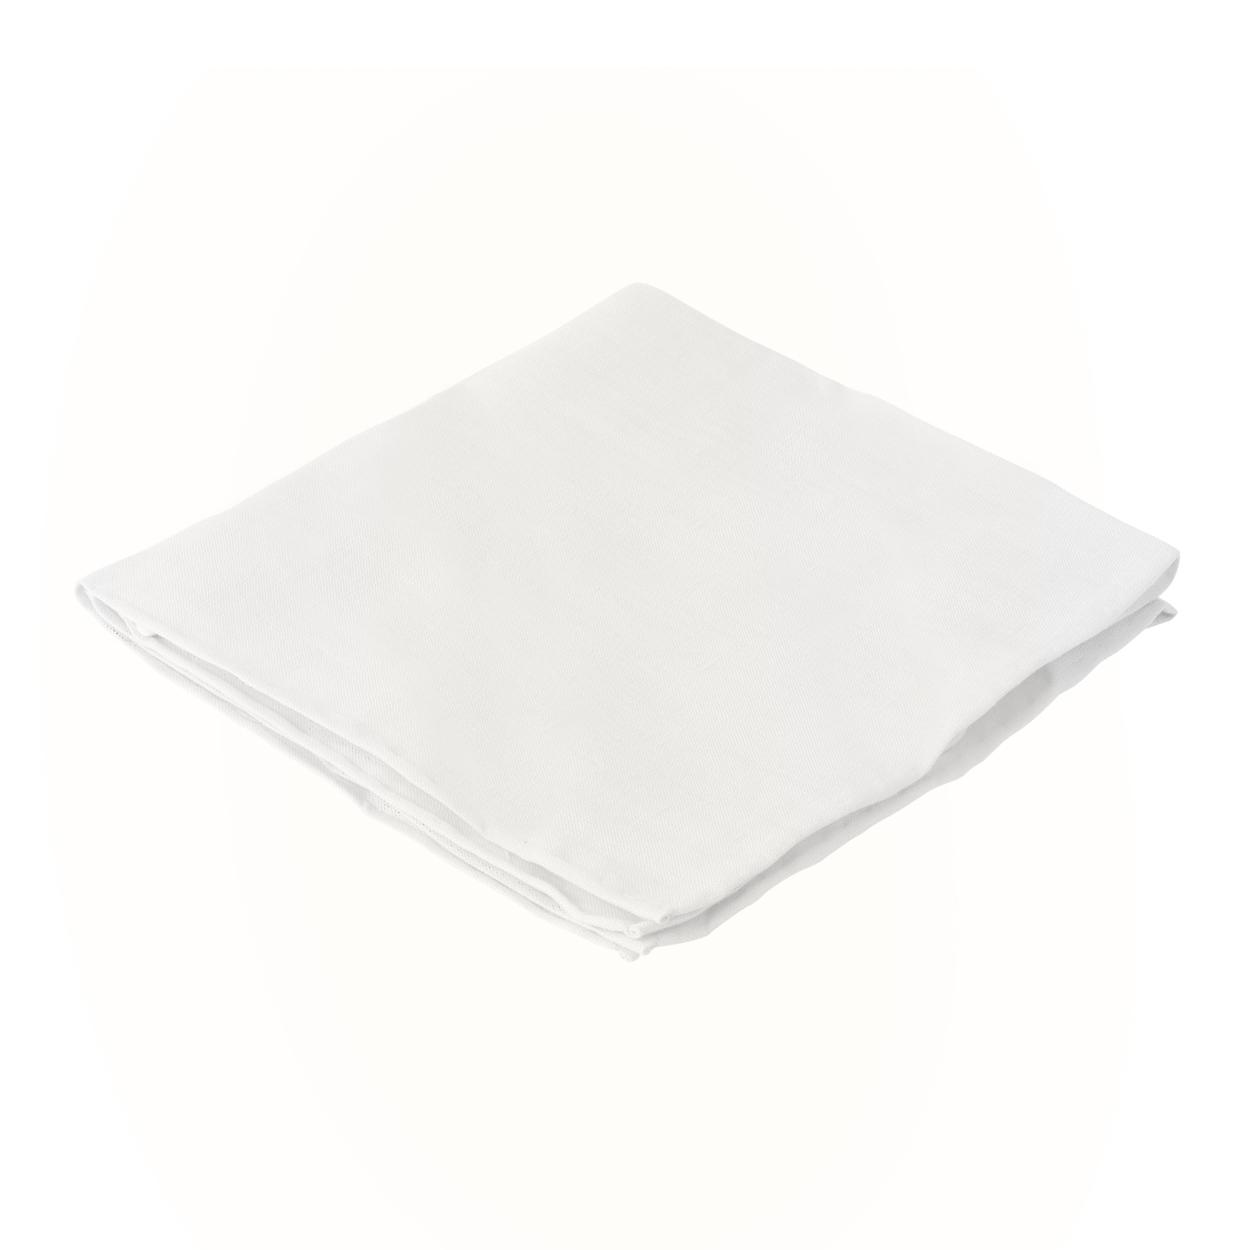 Jacob-Alexander-Linen-Handrolled-15-034-x-15-034-Pocket-Square-Hanky thumbnail 42